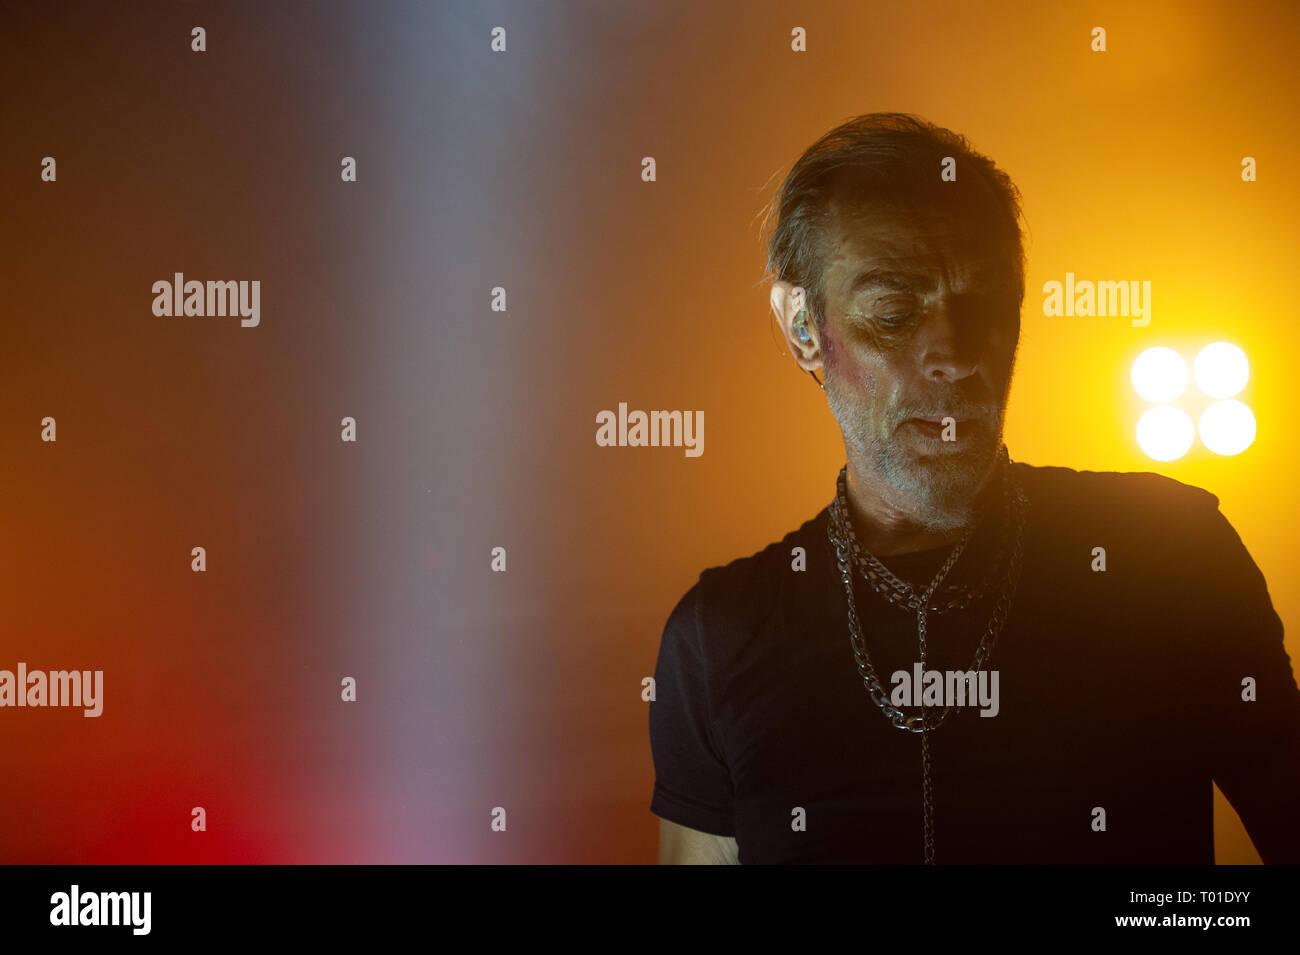 Peter Murphy, Sänger und Chef der englischen 80's Dark Rock Band Bauhaus. im Konzert an Orion-Club, Ciampino, Rom, Italien, 21-11-2018 Stockbild